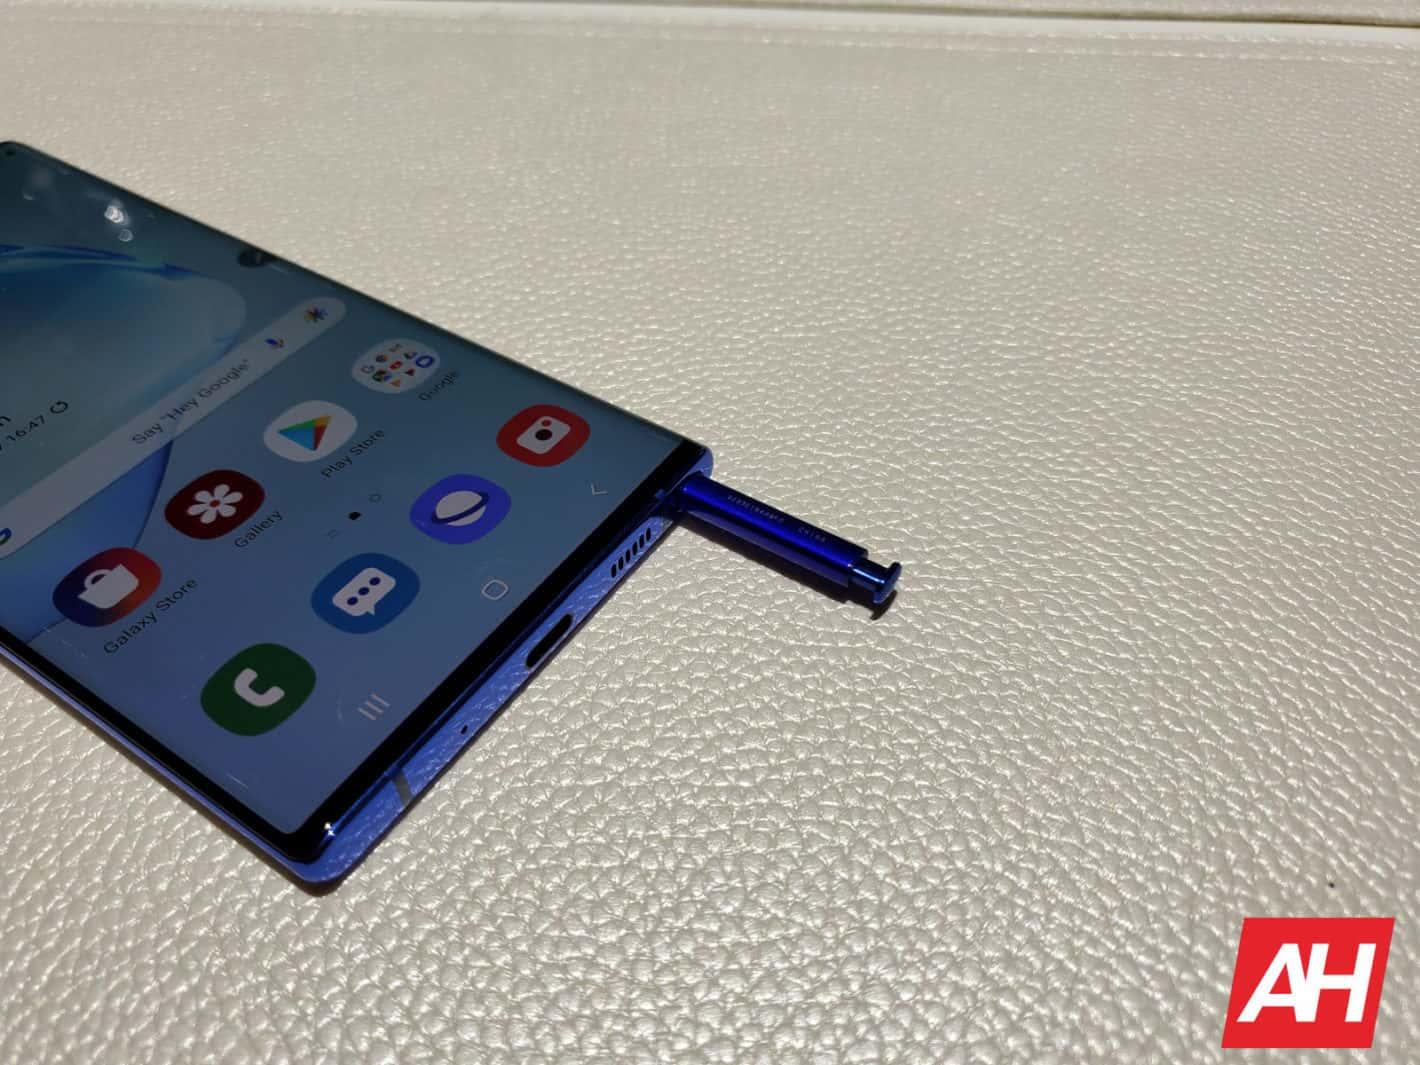 Samsung Galaxy Note 10 Plus AH 2019 16